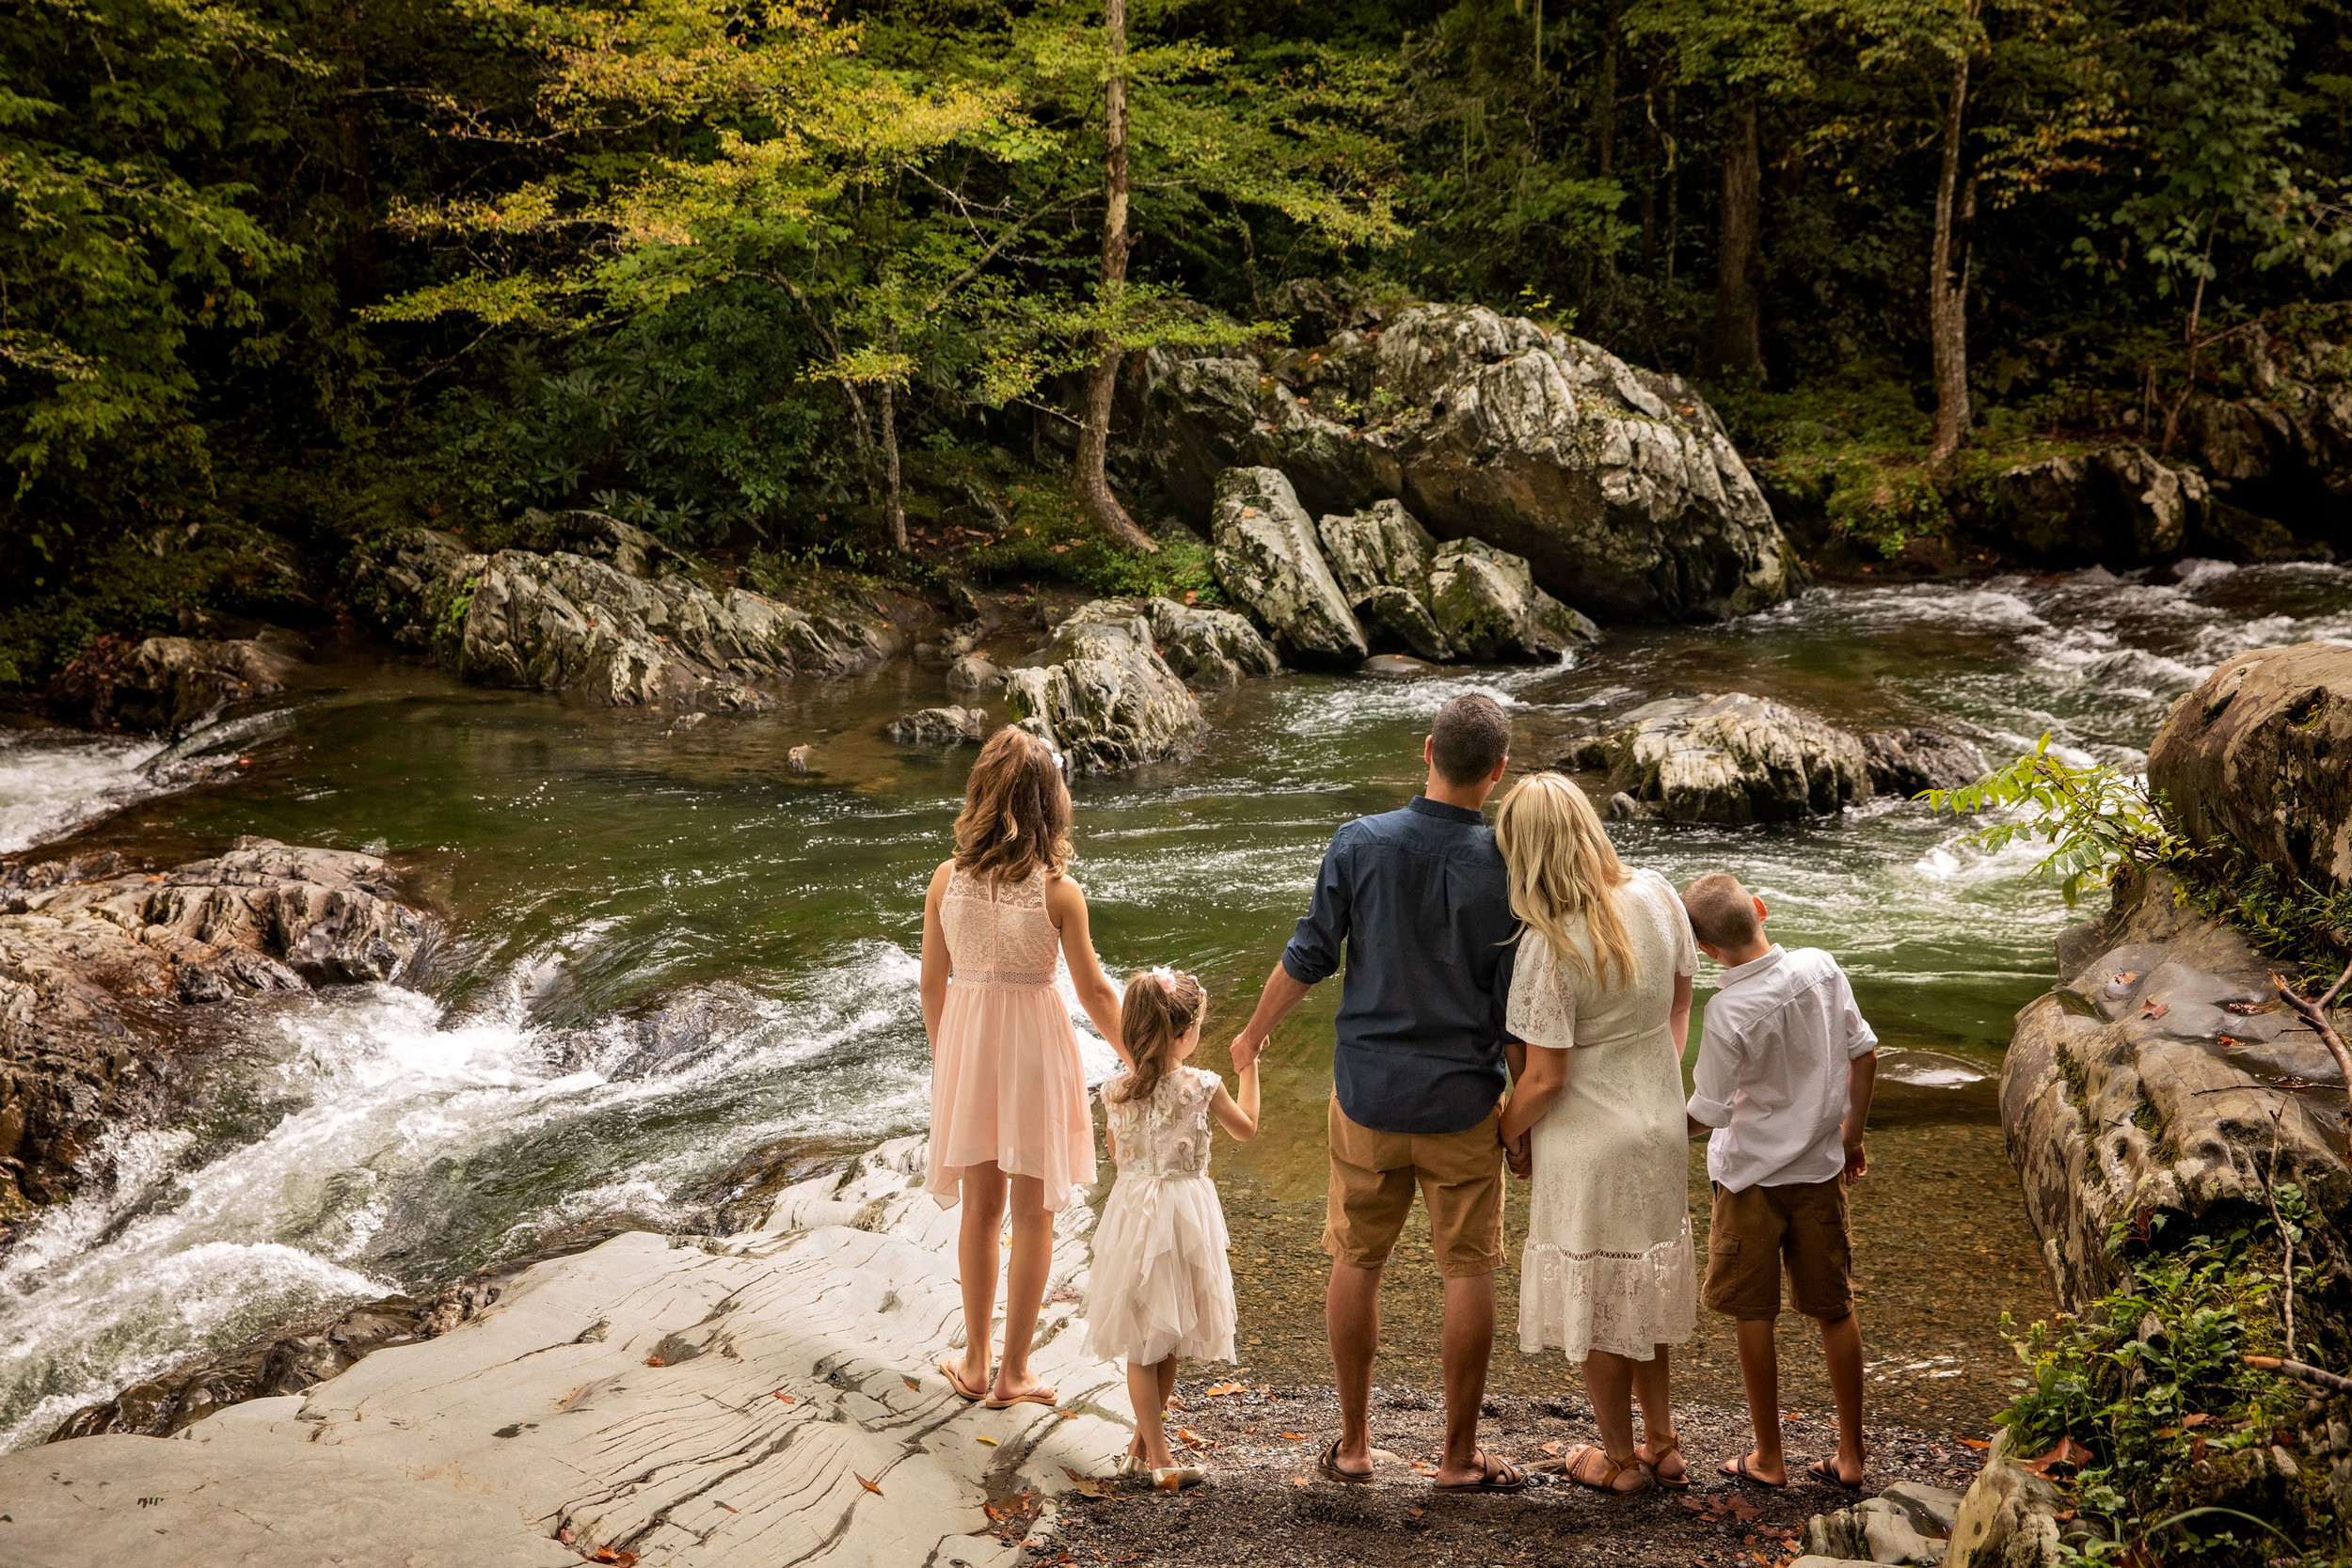 gatlinburg-tn-family-photo-during-elopement-ceremony.jpg